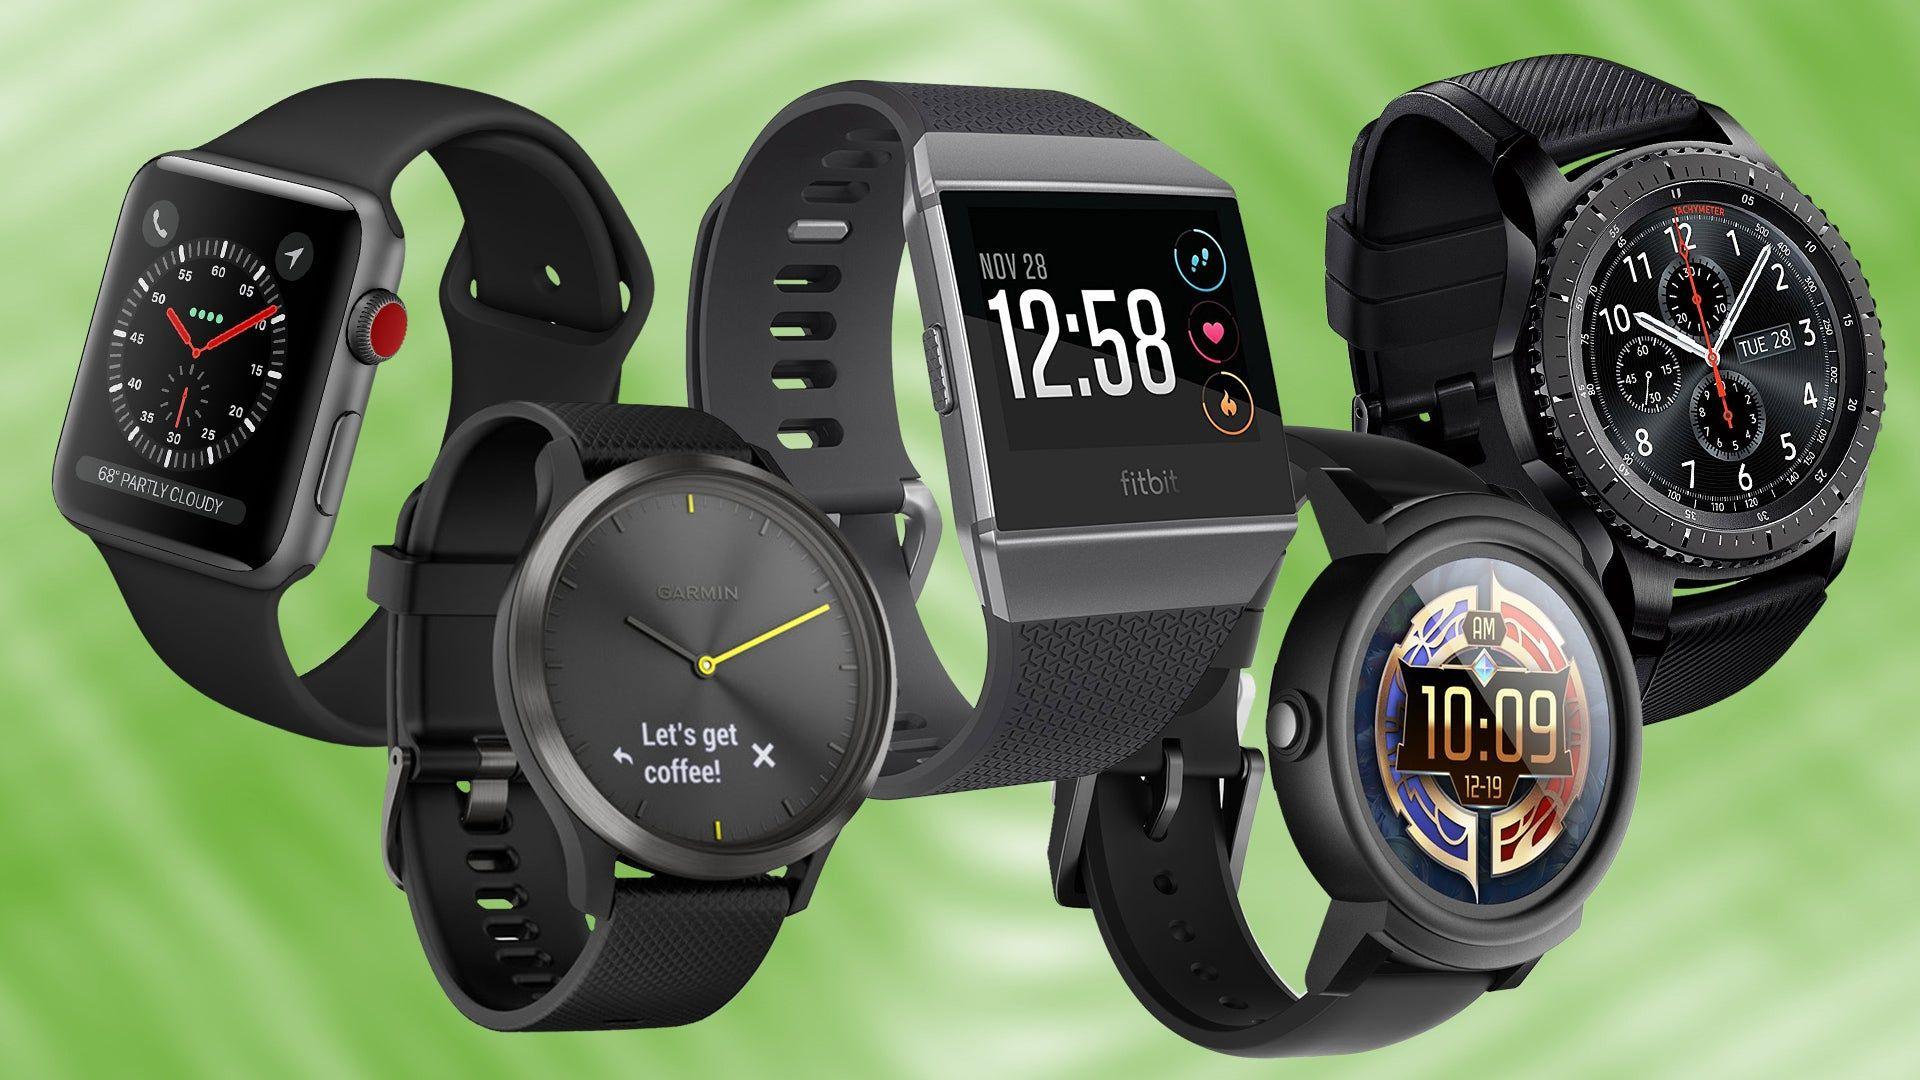 Smartwatch wallpaper free